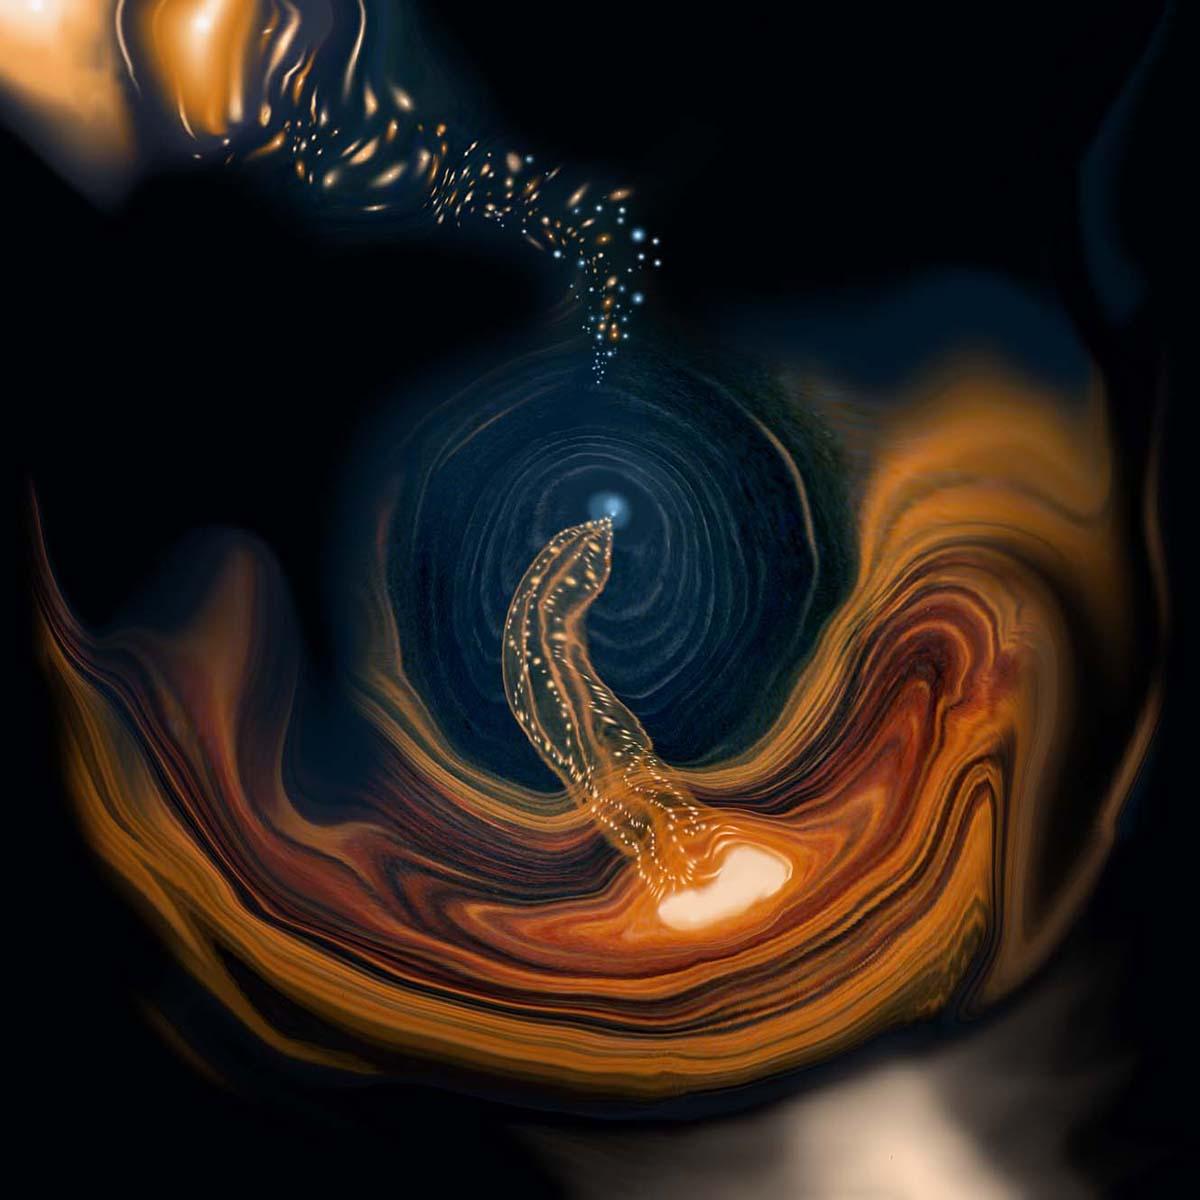 Agujero espiral anaranjado